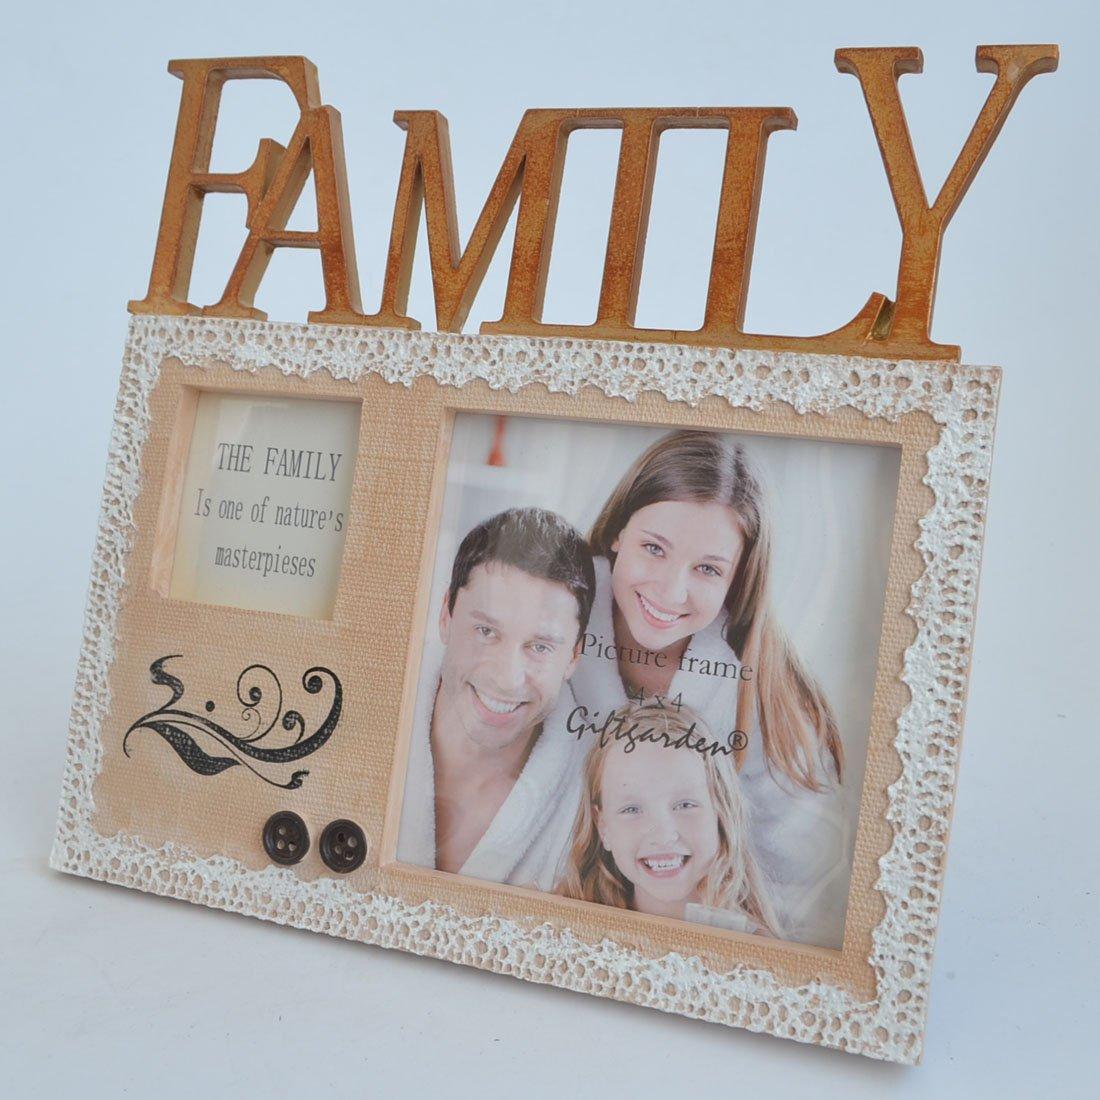 Amazon.de: Giftgarden 10x10 Kunstharz Bilderrahmen mit Family ...